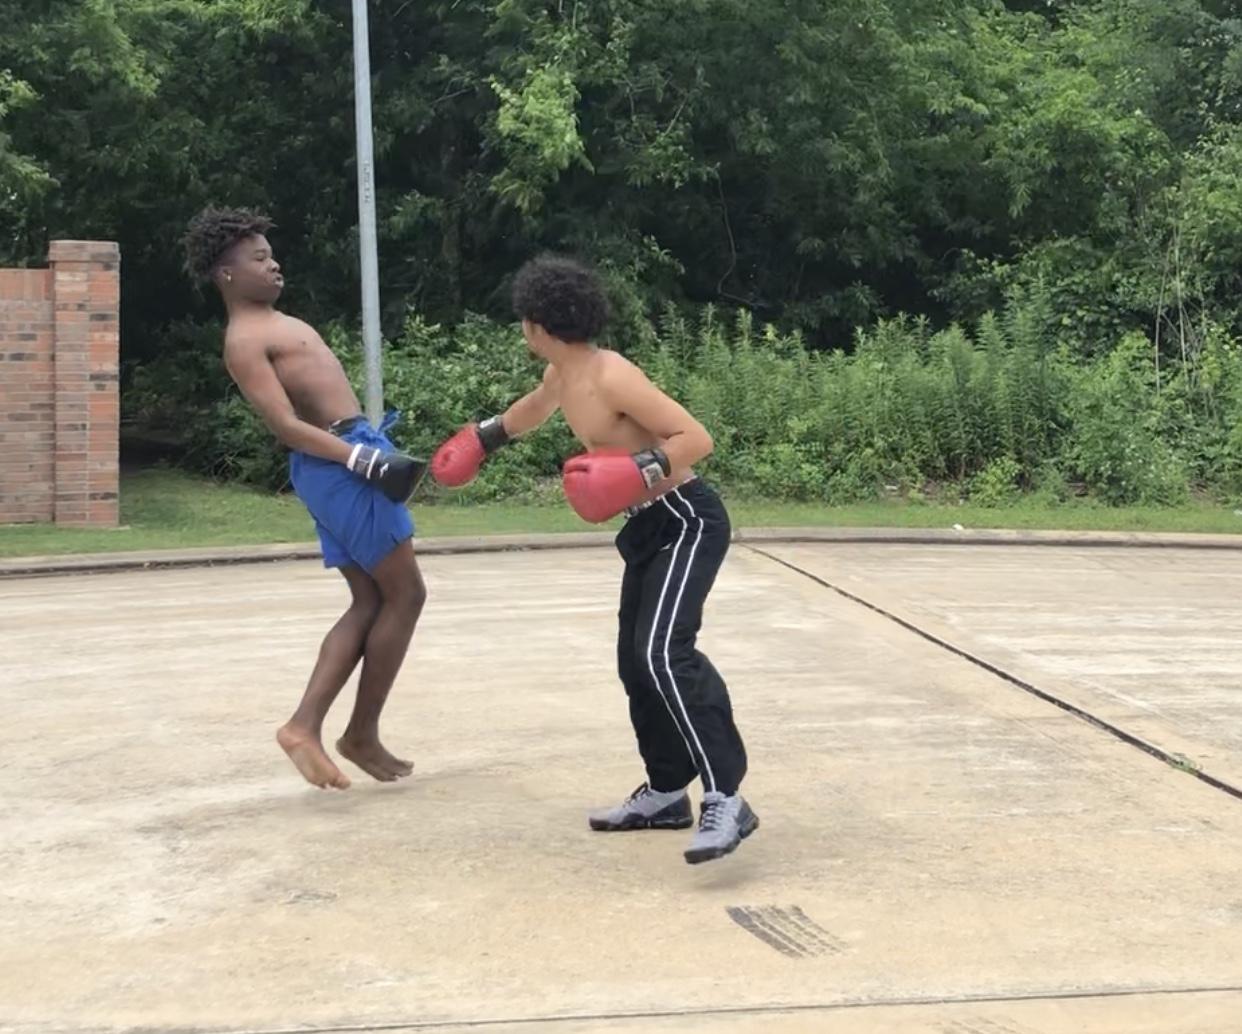 Outside of my house boxing my friend, Rhaman Anifowoshe.